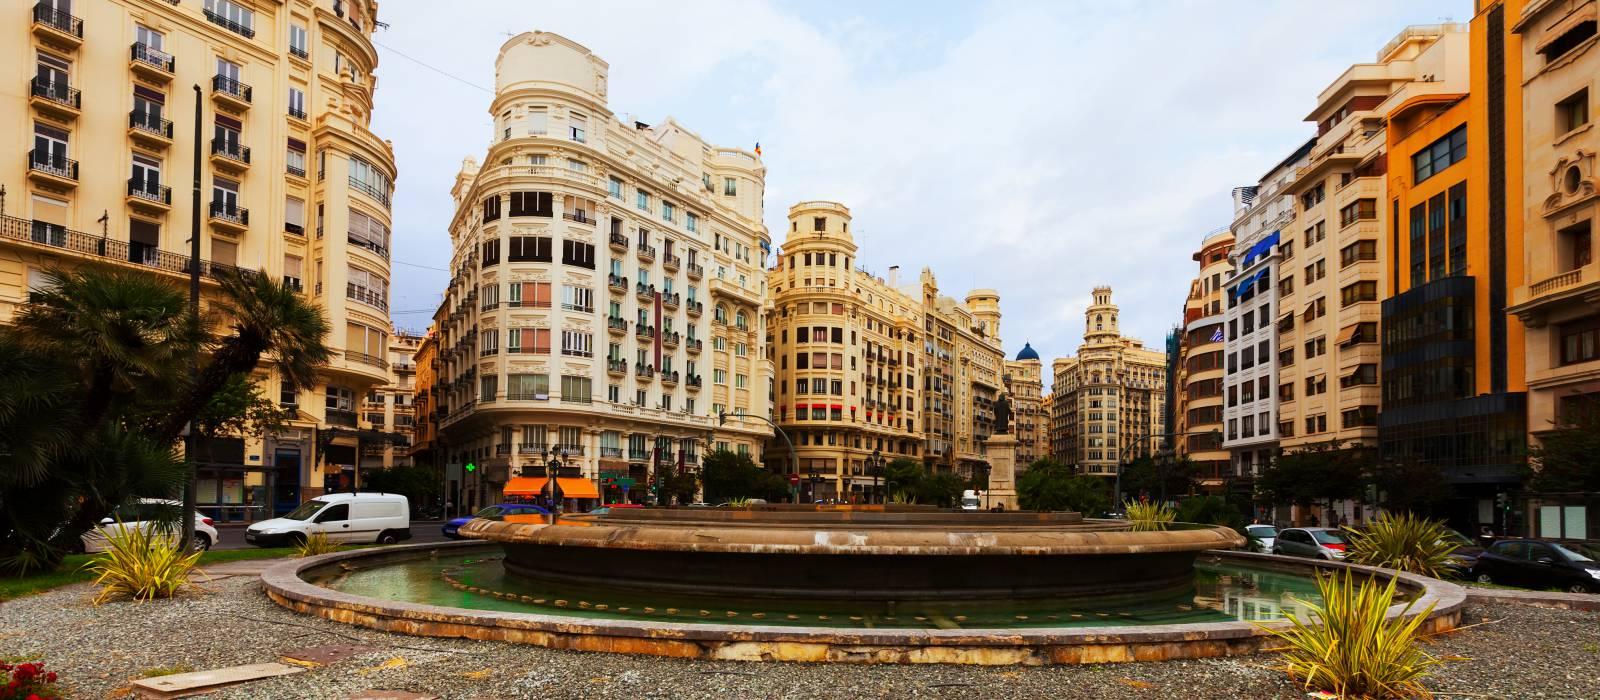 Hôtels à Valence - Vincci Hoteles